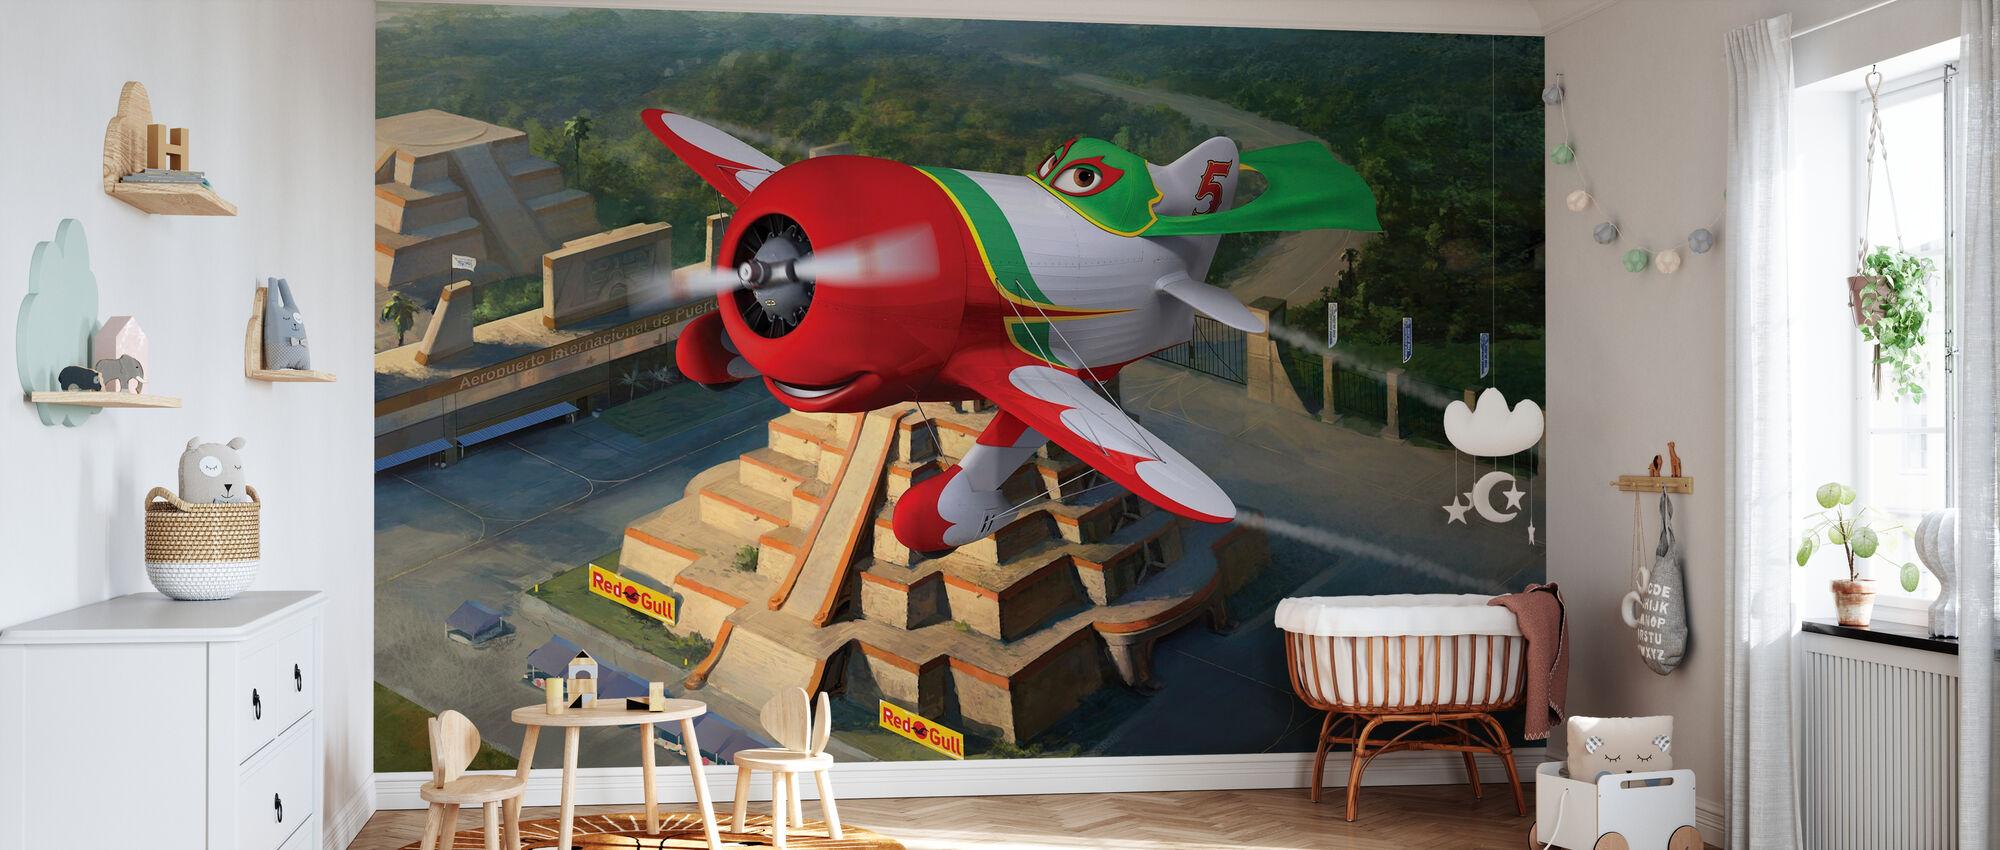 Lentokoneet - Chupacabra - Tapetti - Vauvan huone